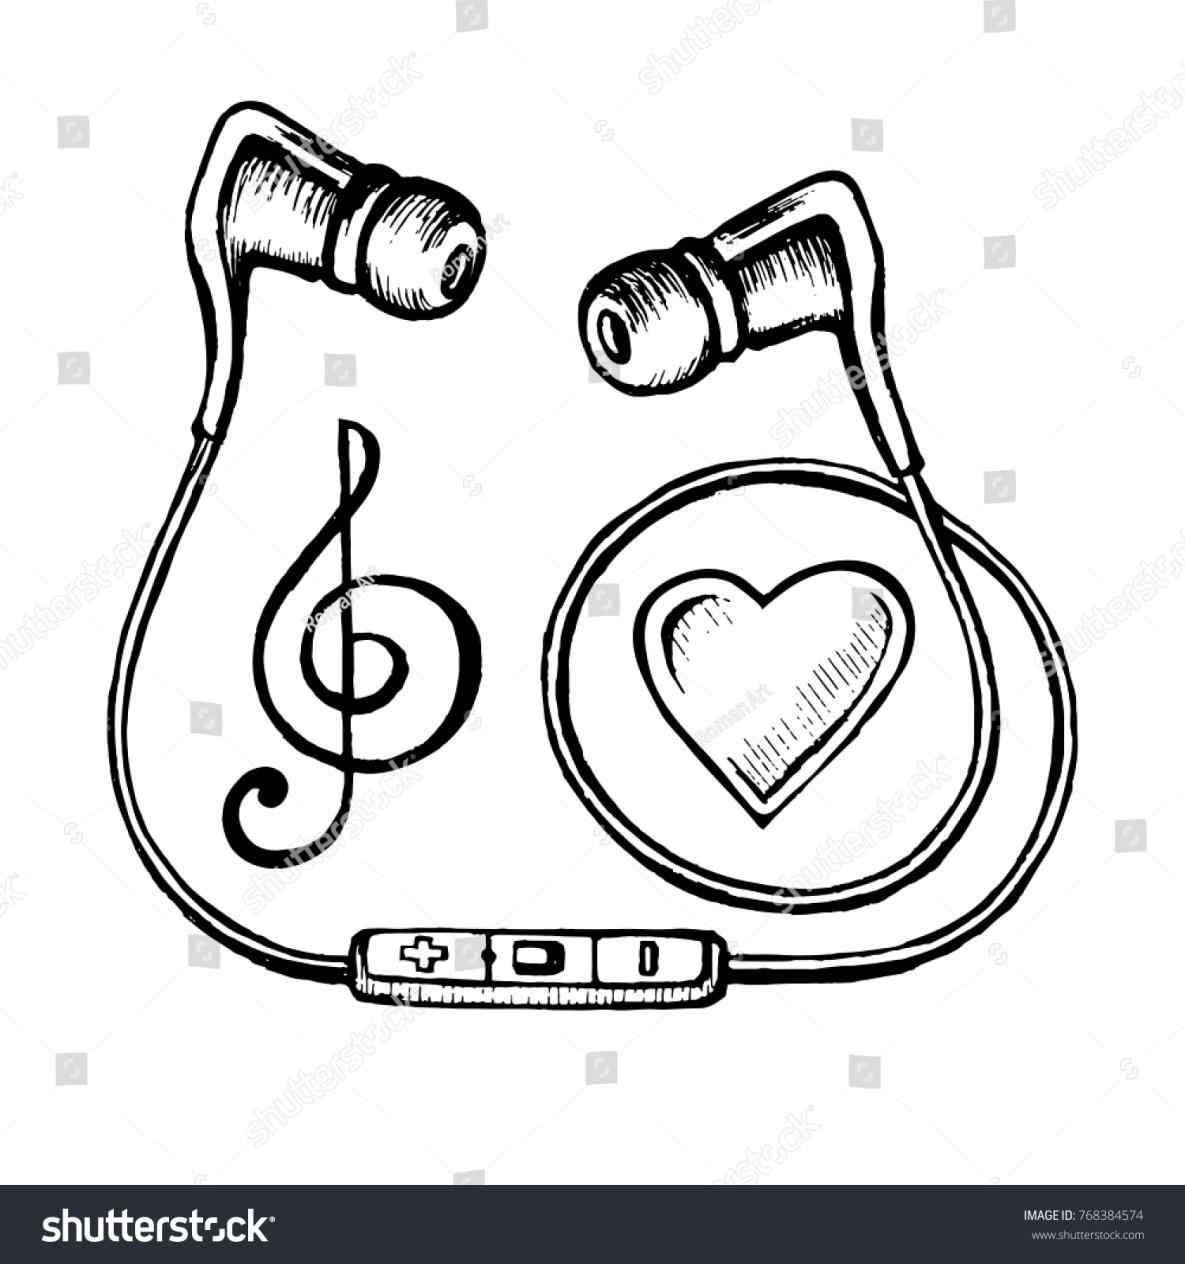 1185x1264 Vector Headphones Microphone And Music Notes Drawing Doodle Sketch Music Notes Drawing Music Drawings Doodle Art Journals